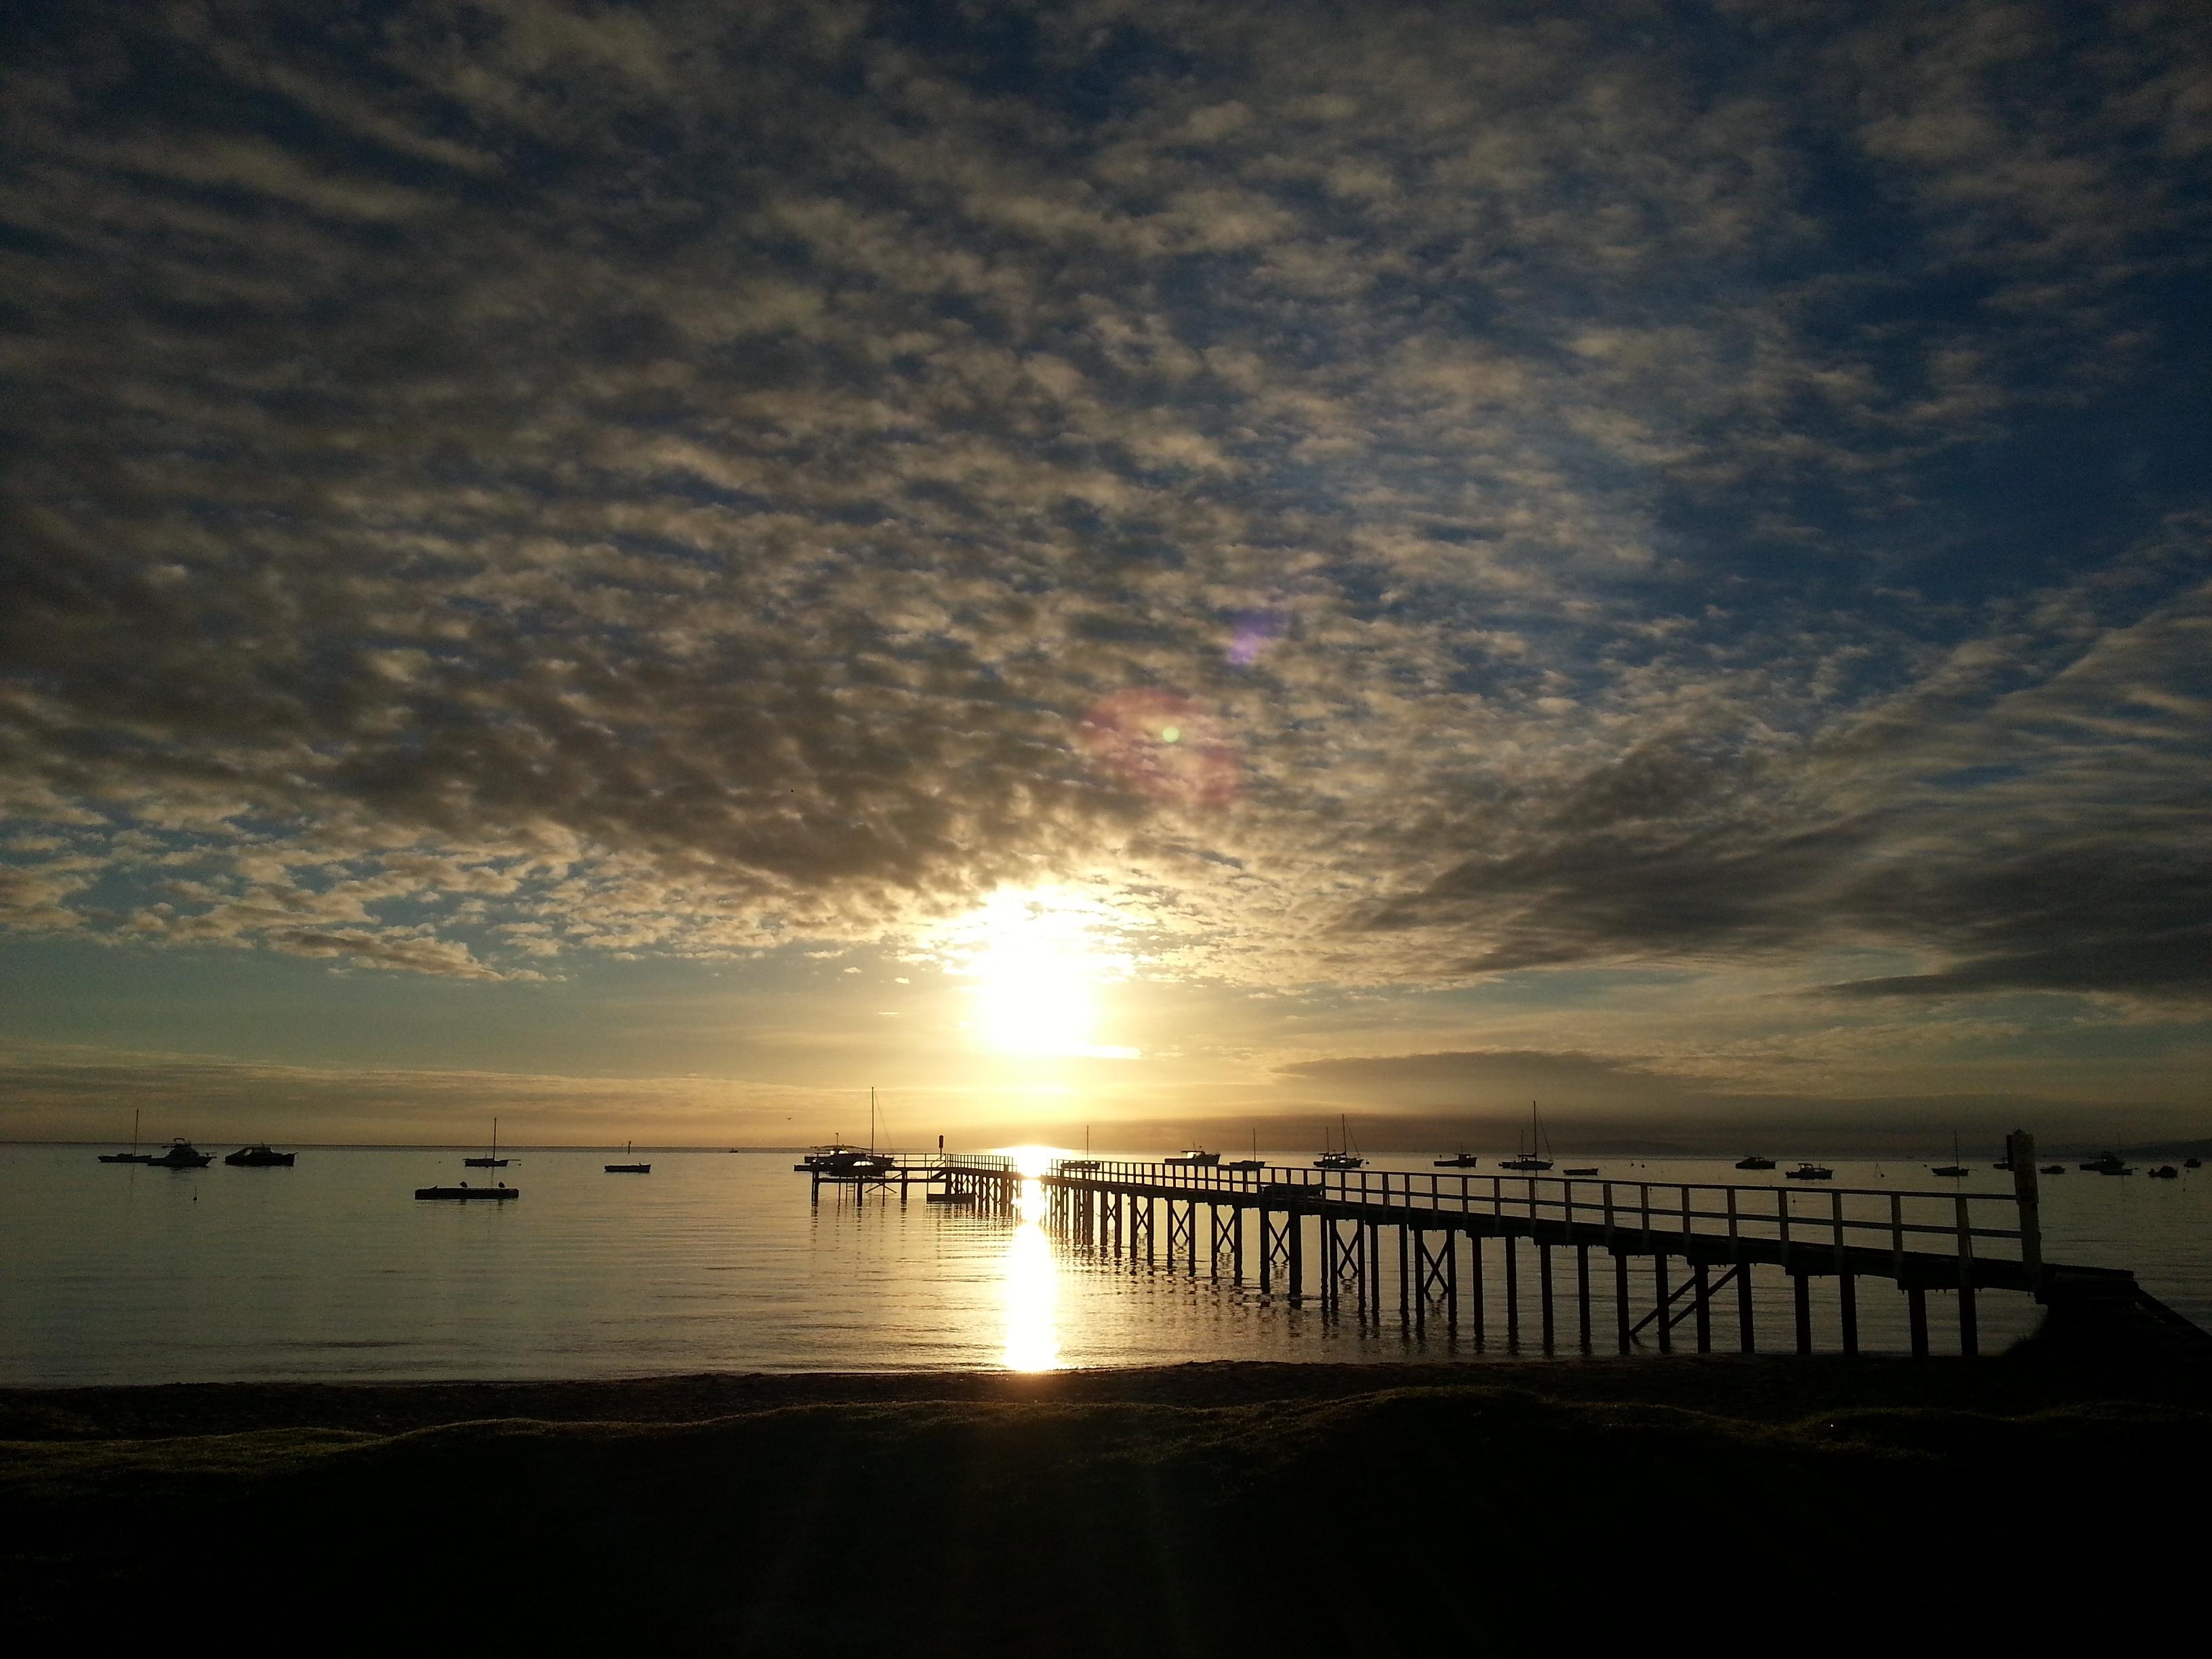 Jan 11, 2017 Blog Post Samantha Wood